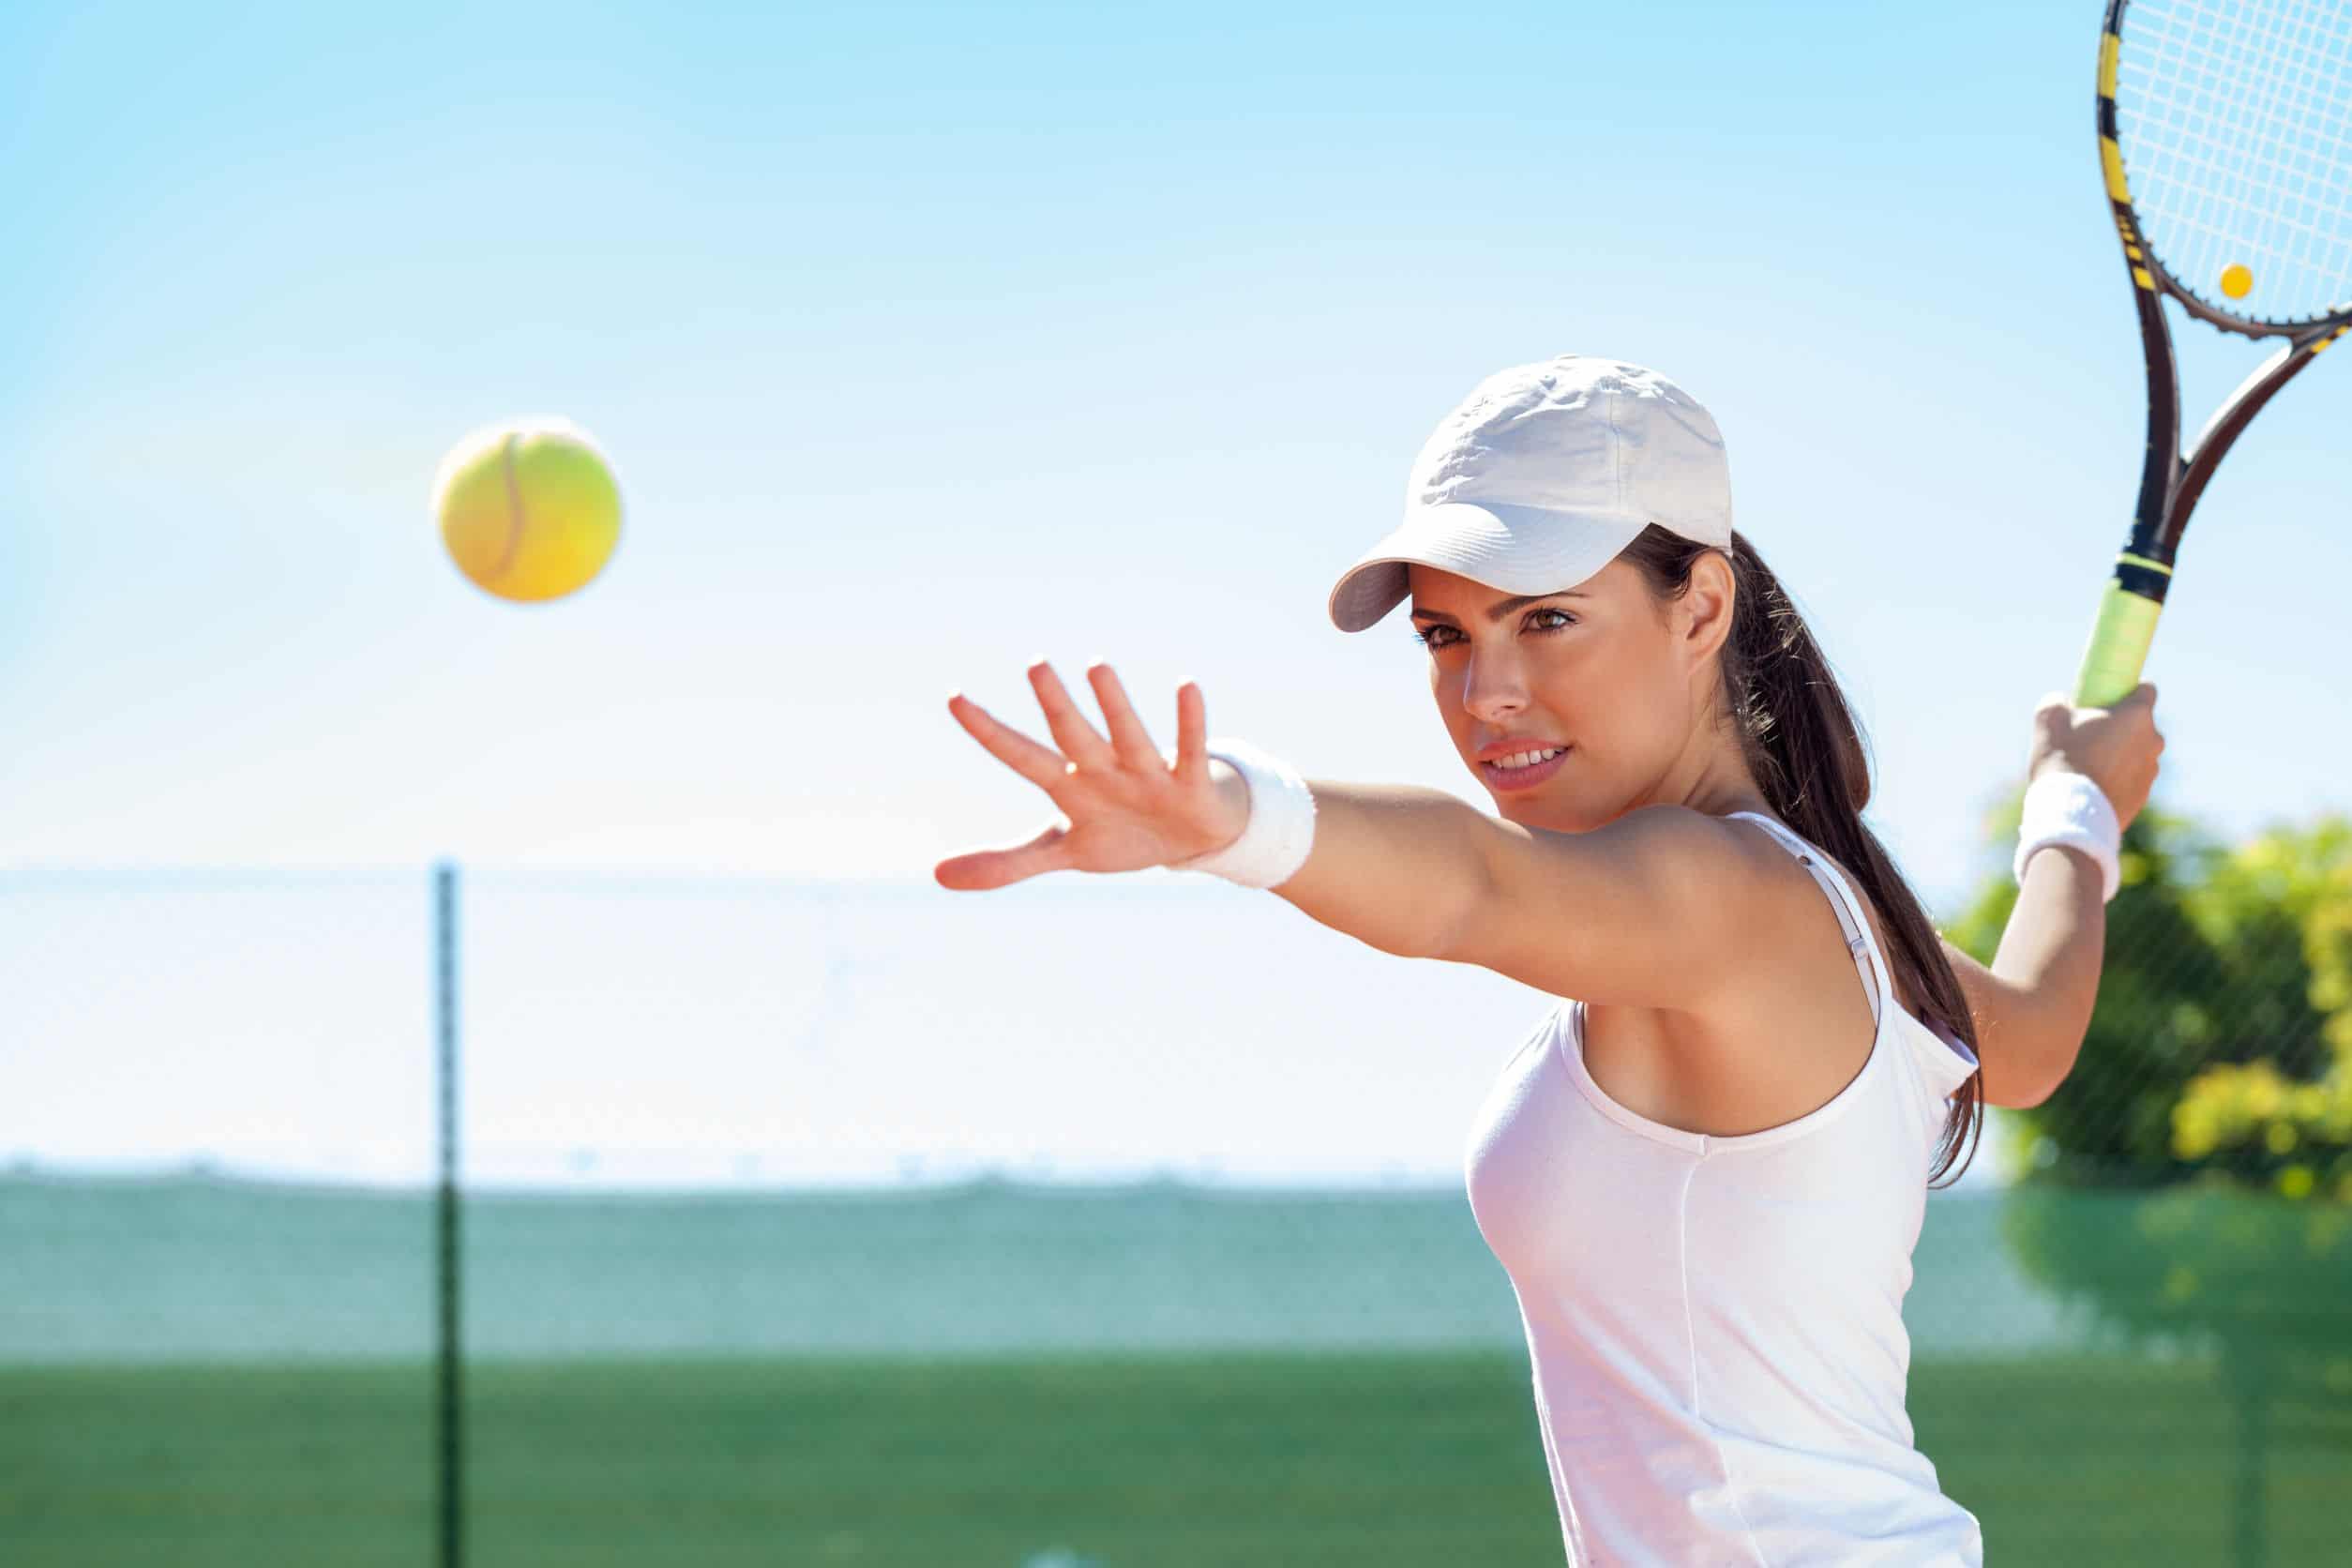 palle-da-tennis-xcyp1